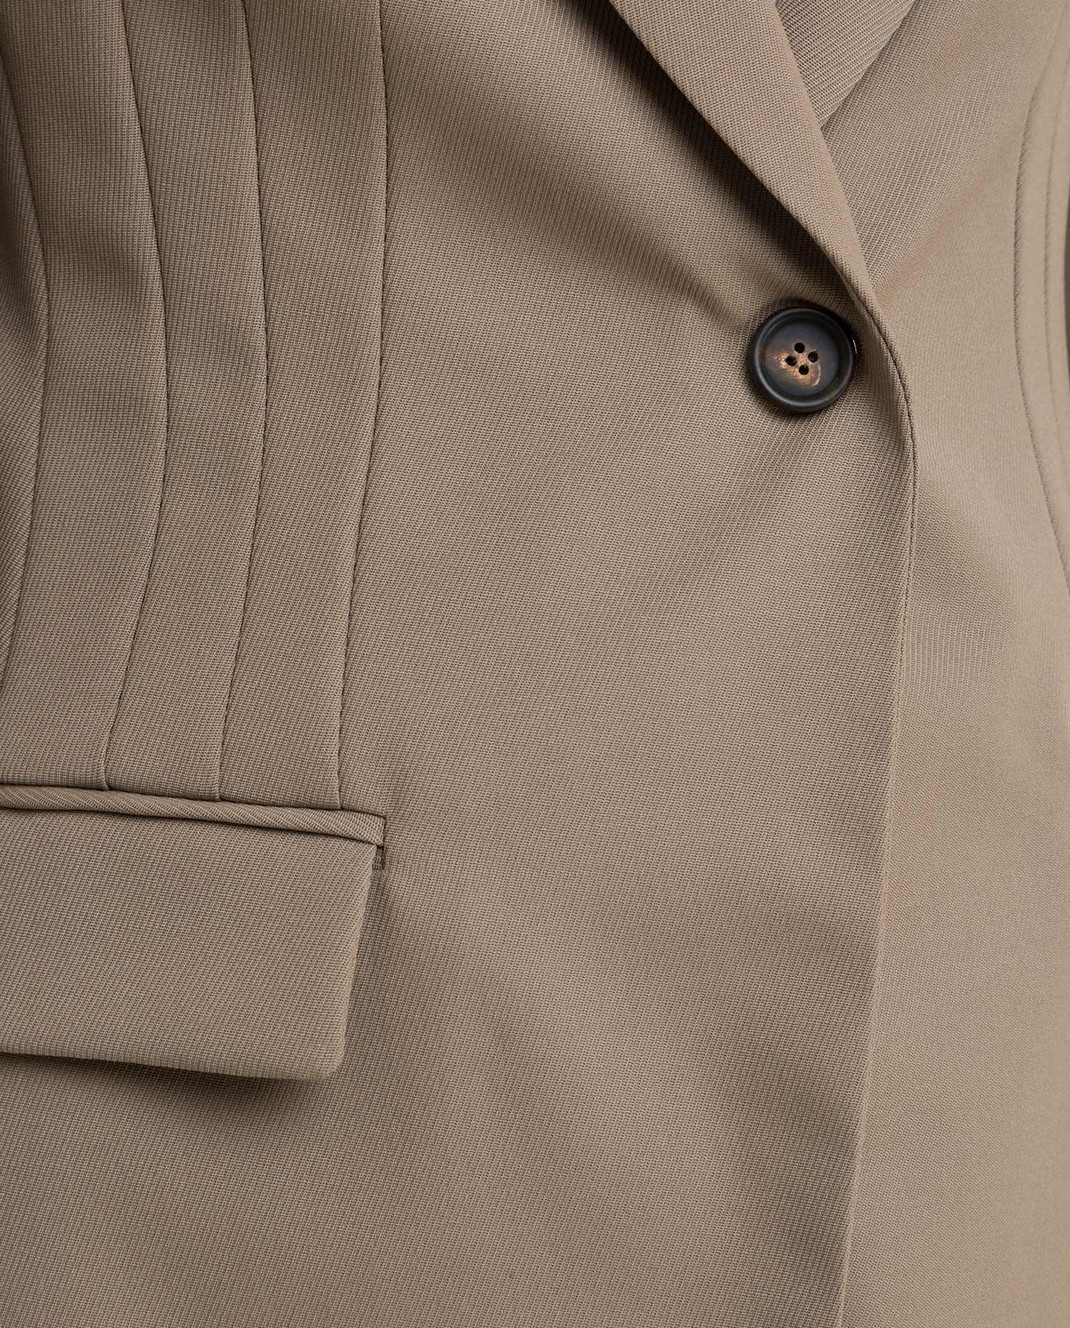 Brunello Cucinelli Бежевый костюм из шерсти изображение 5